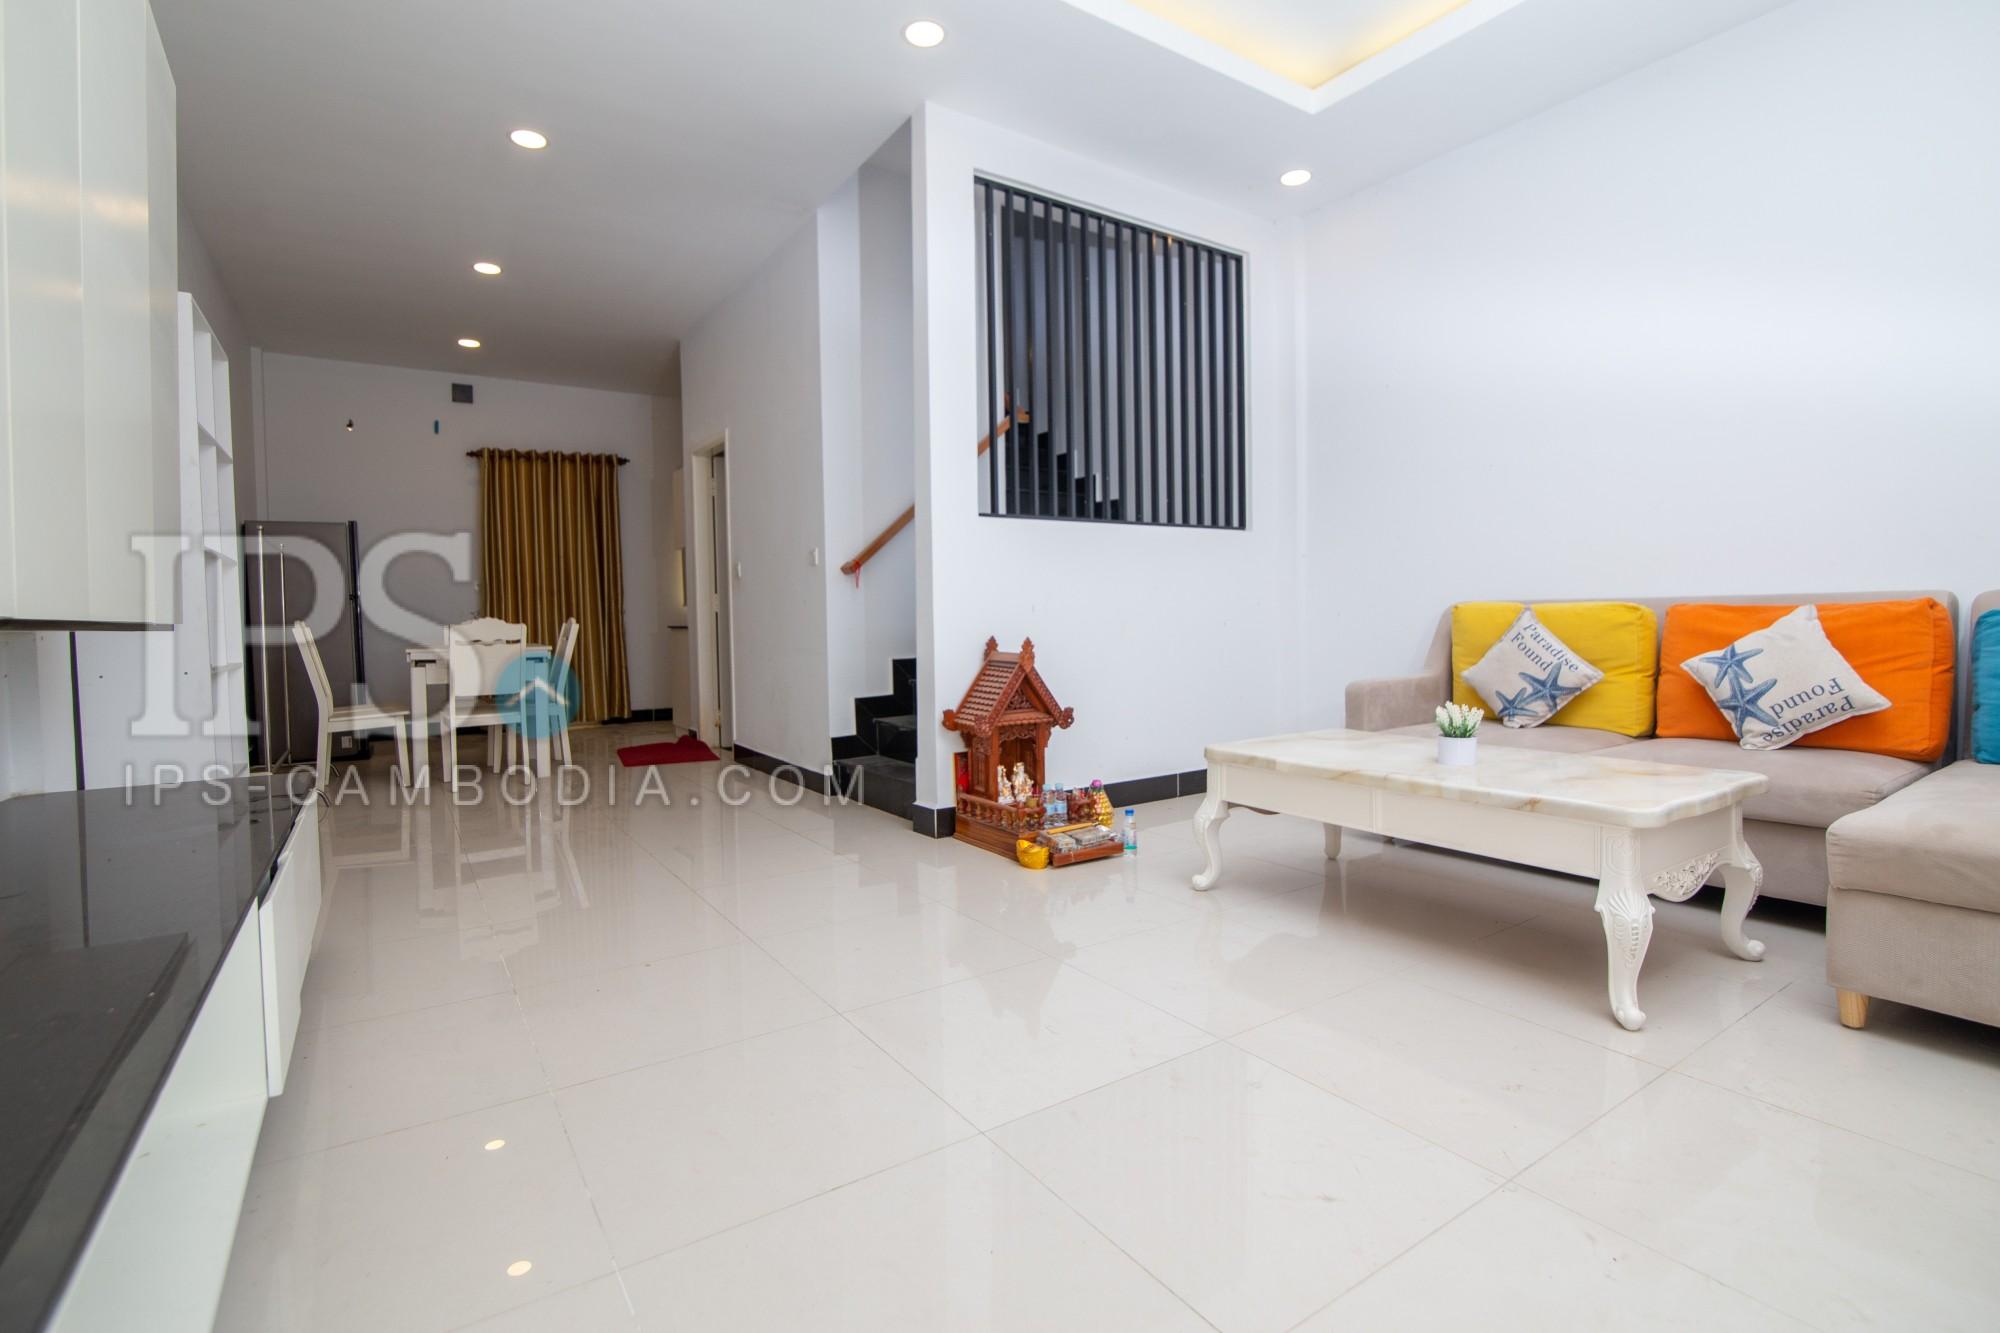 3 Bedroom Twin Villa For Rent - Preak Leab, Chroy Changvar, Phnom Penh